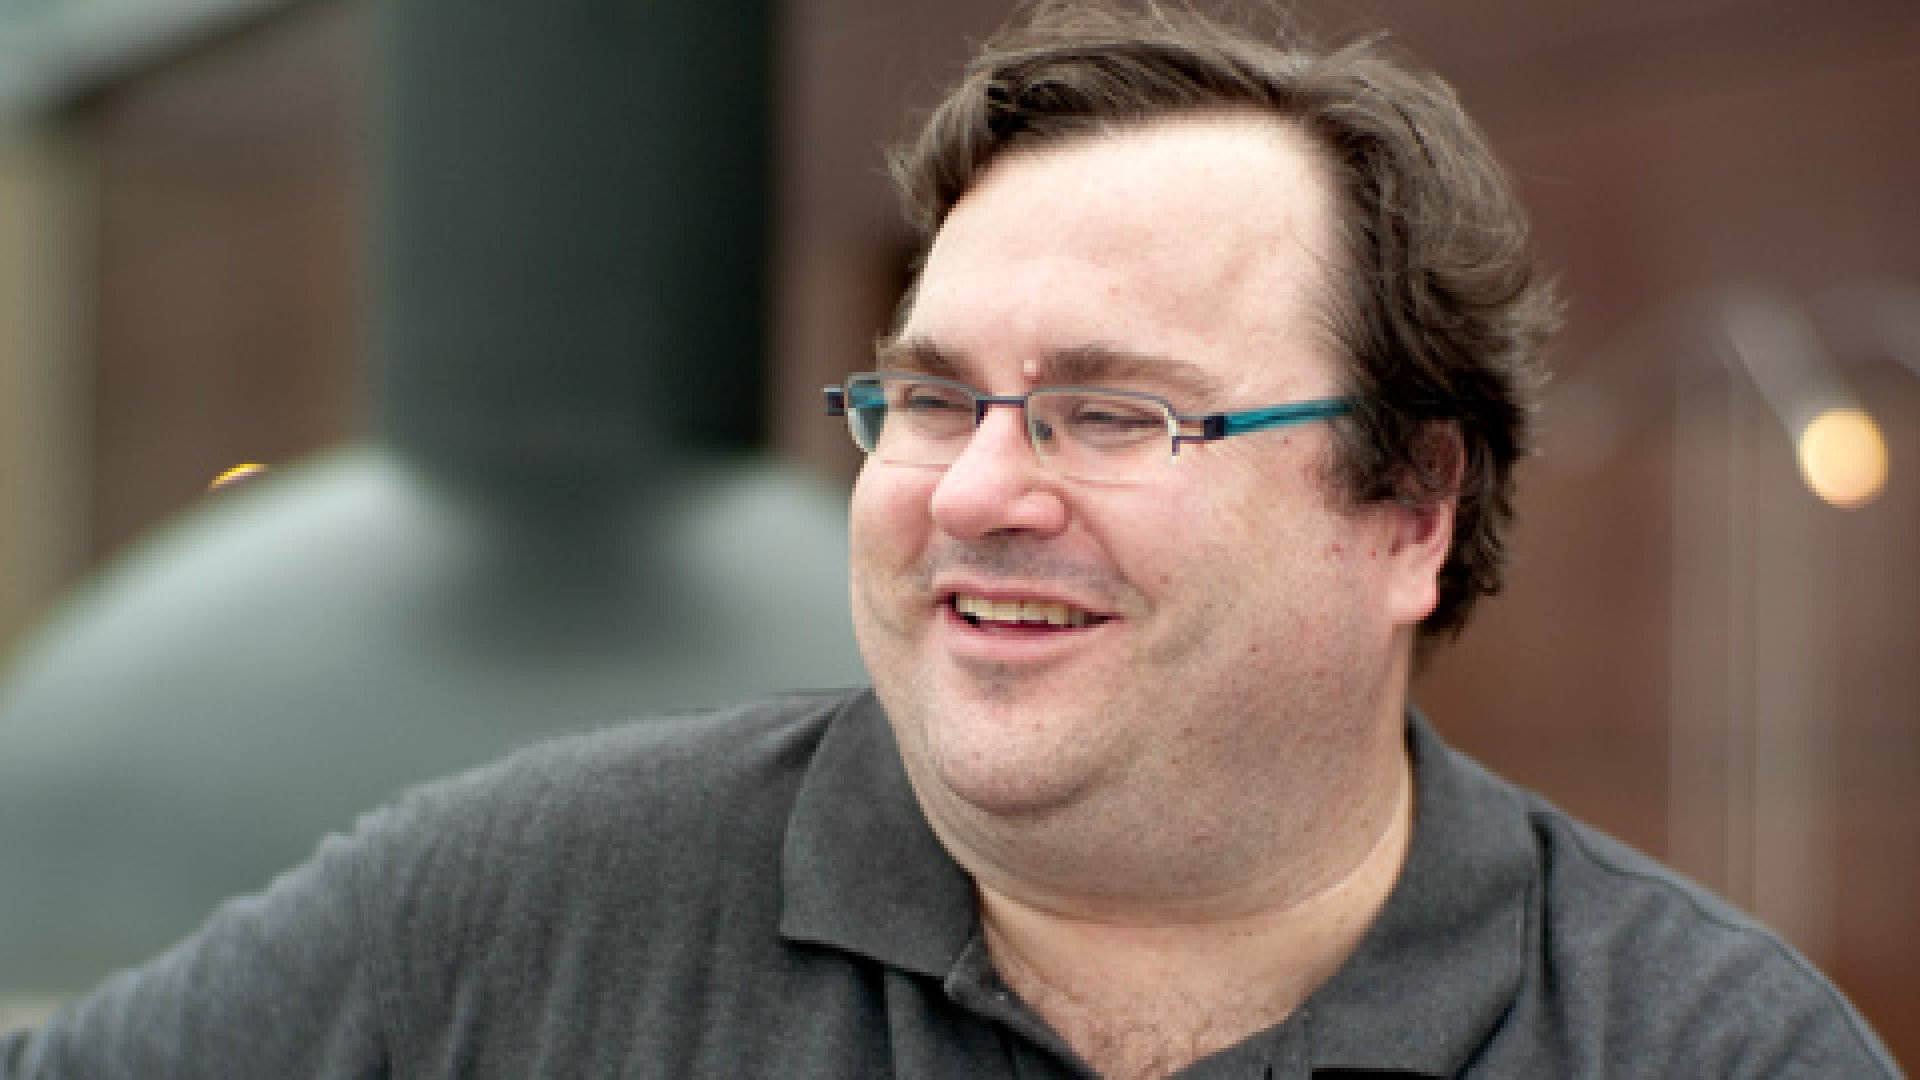 Reid Hoffman, LinkedIn